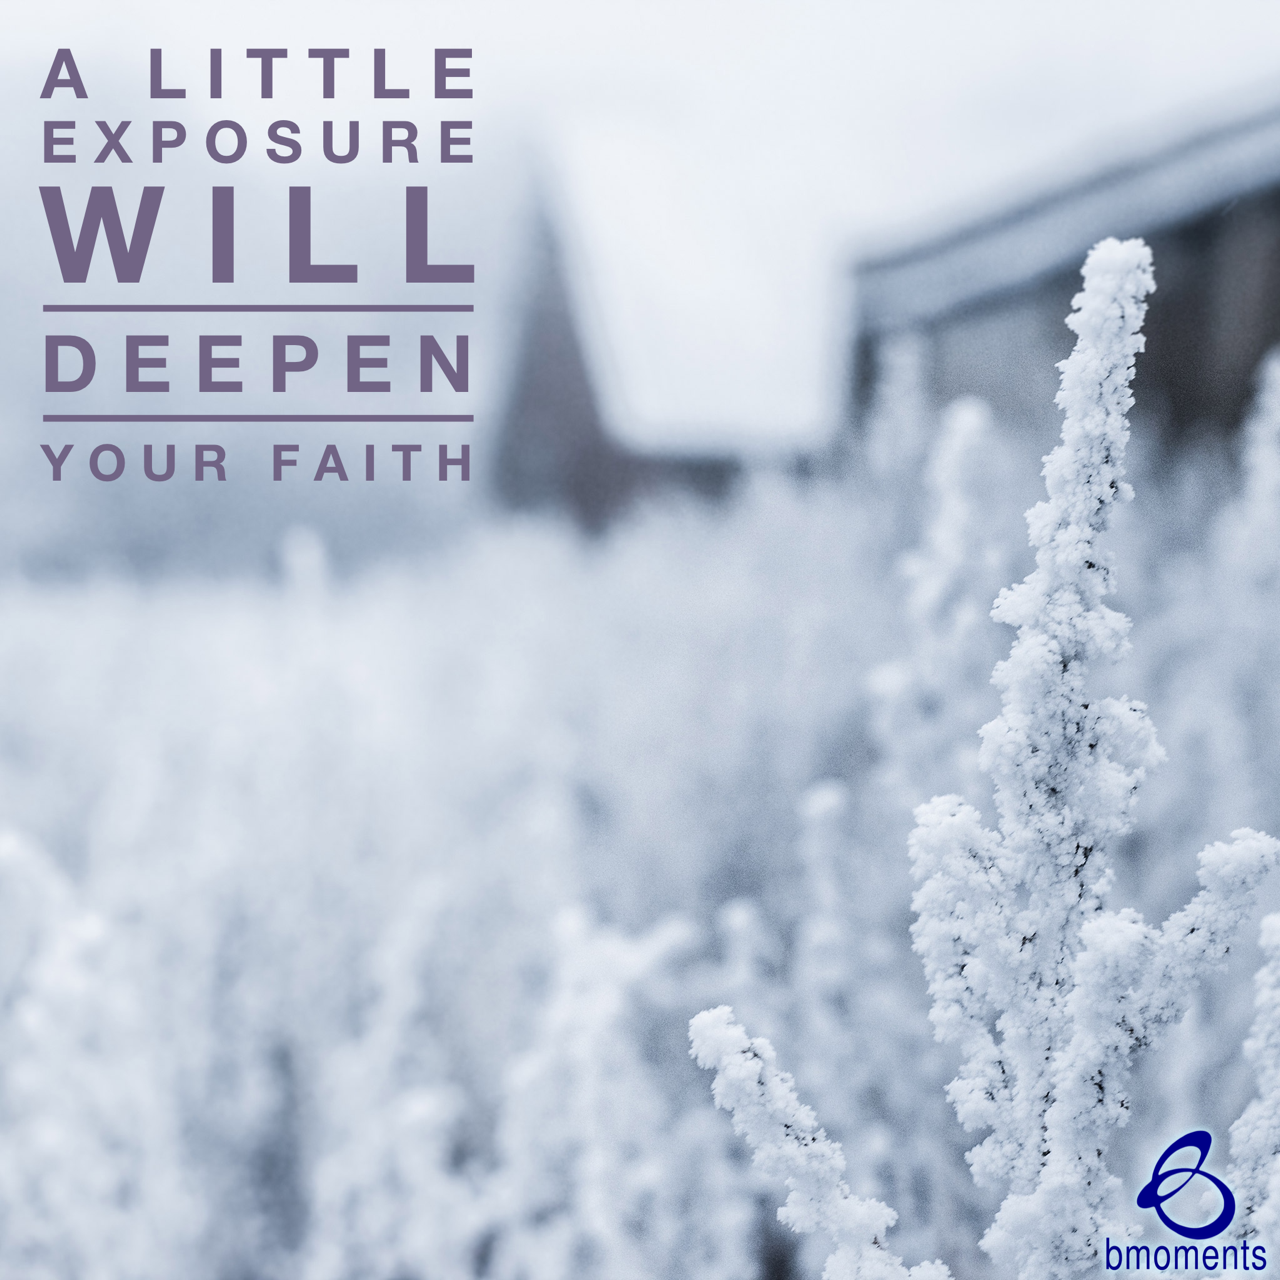 Let a Little Exposure Deepen Your Faith